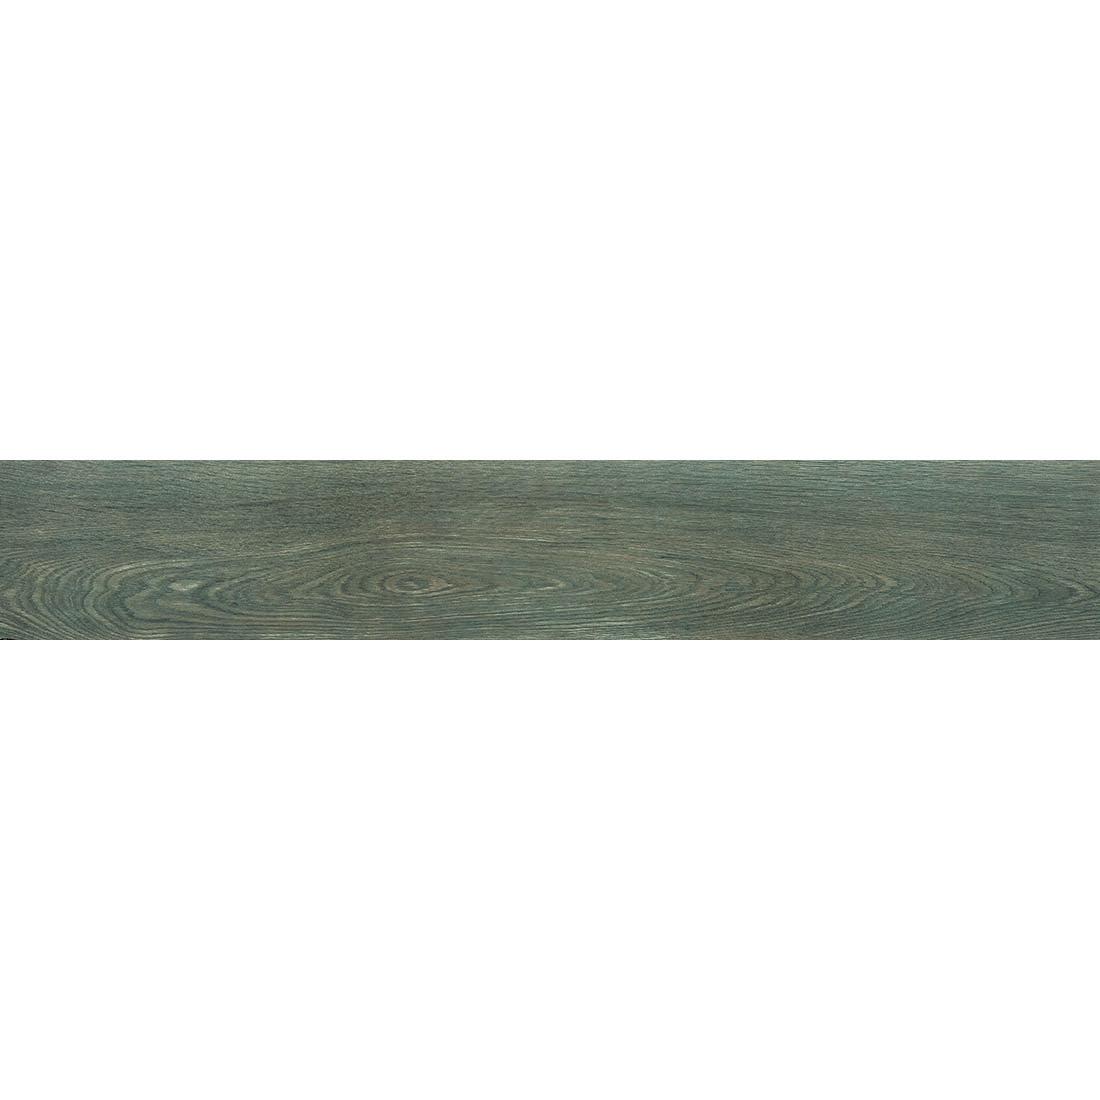 Candlewood 20x120 Nogal Gloss